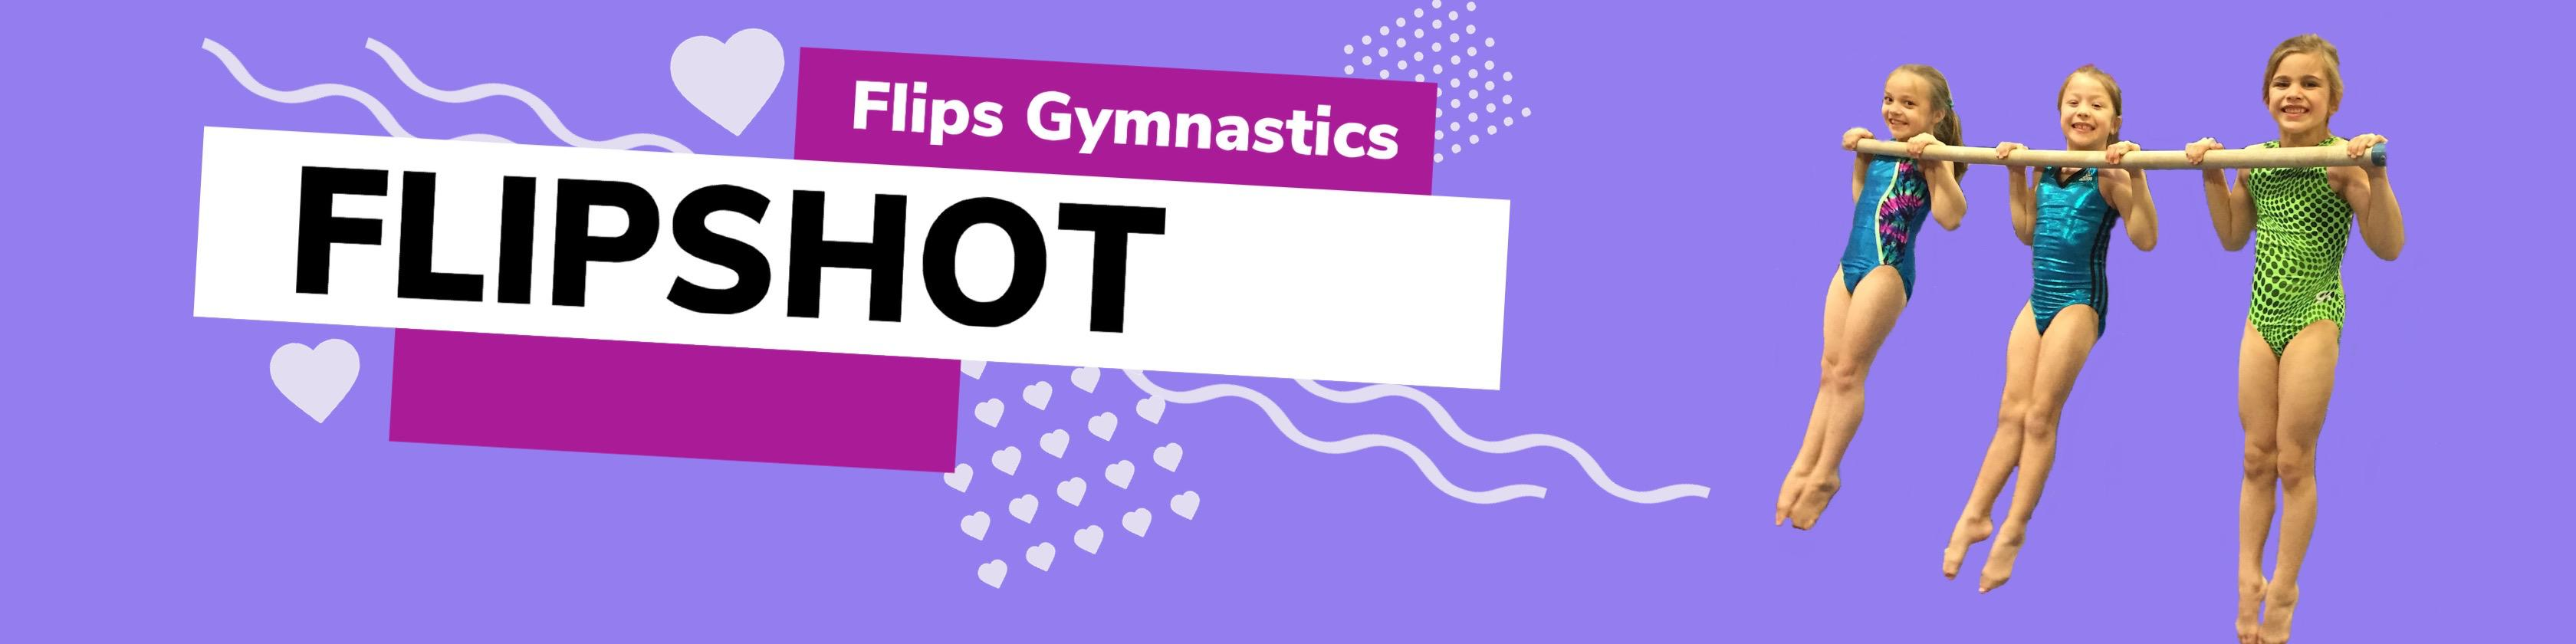 Flips Gymnastics Flipshots Team Track